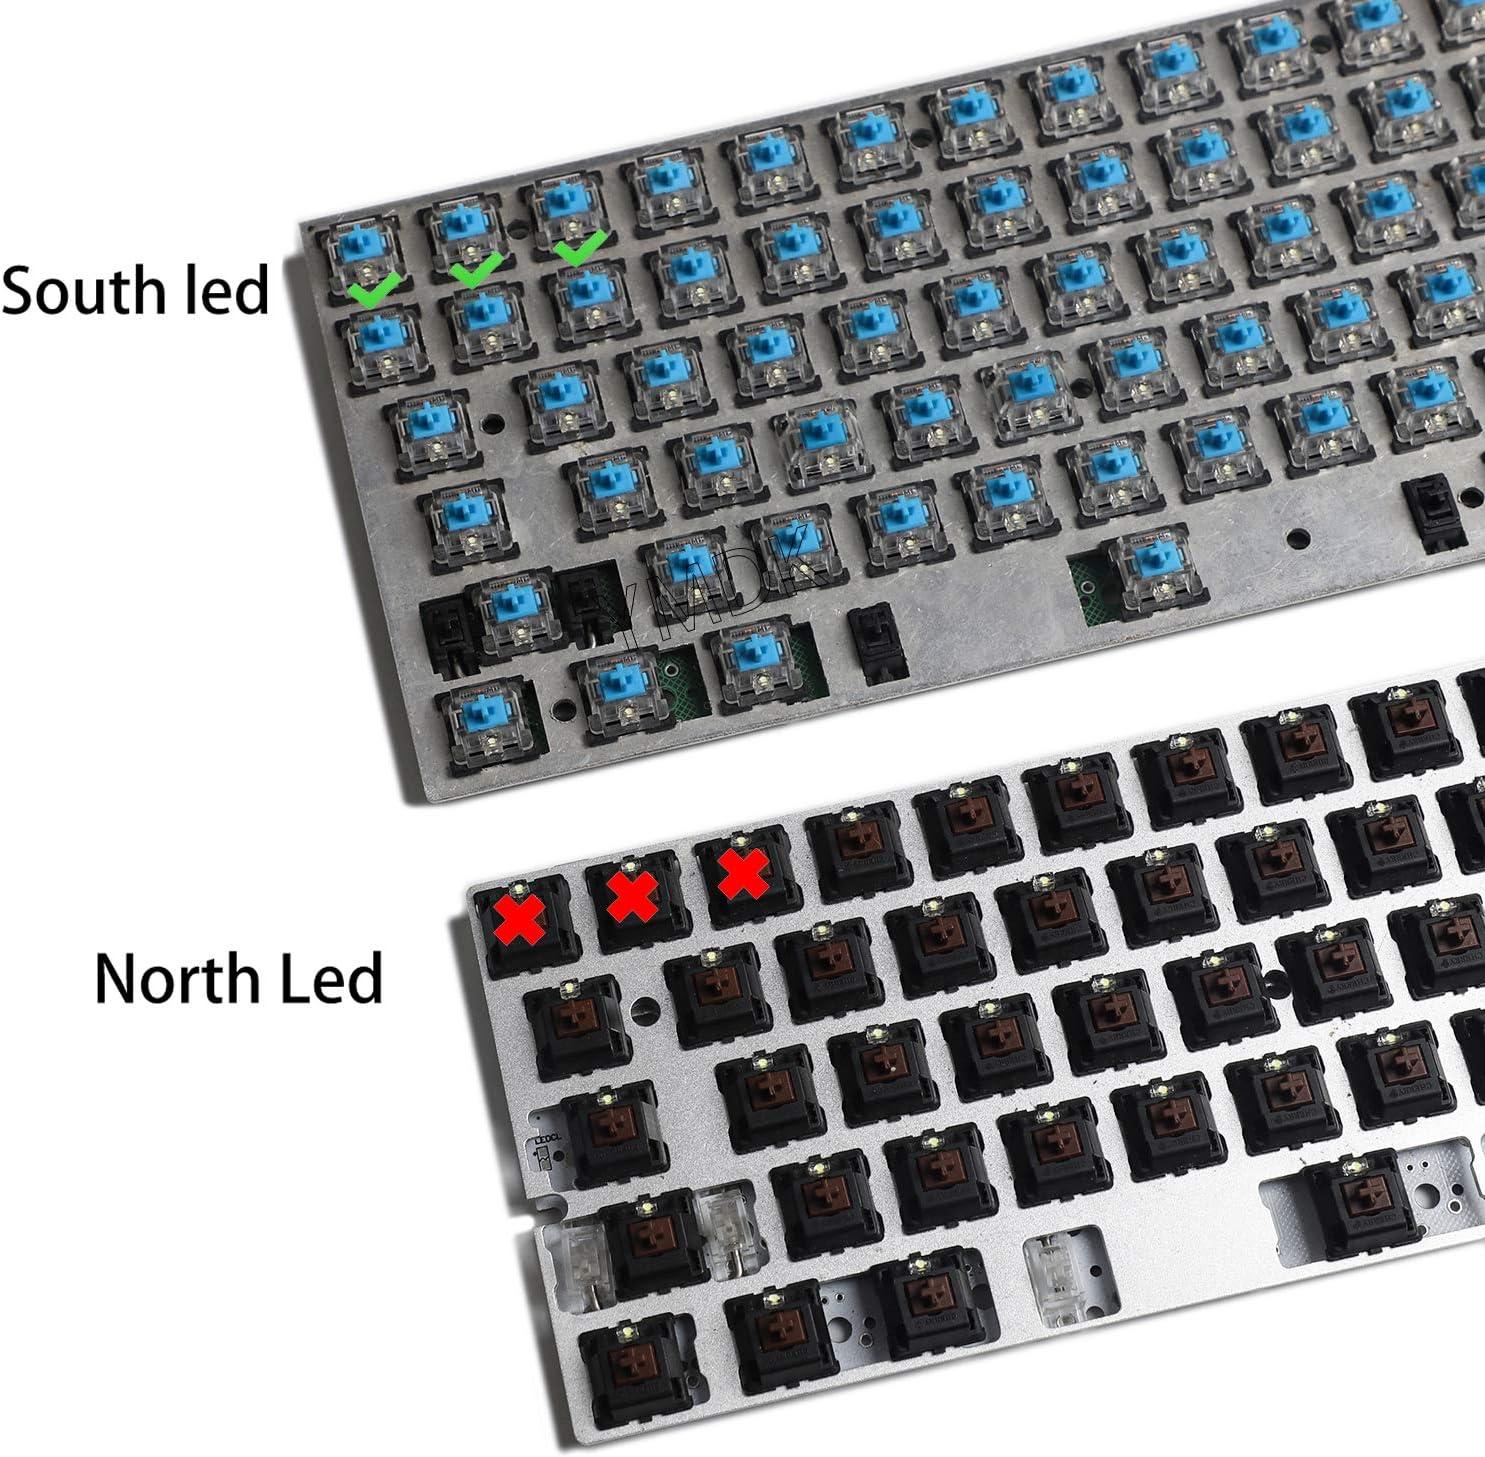 Black White PBT Double Shot 104 Side-lit Shine Through Translucent Backlit keycaps OEM Profile for MX Mechanical Keyboard Filco (White)(Only Keycap)